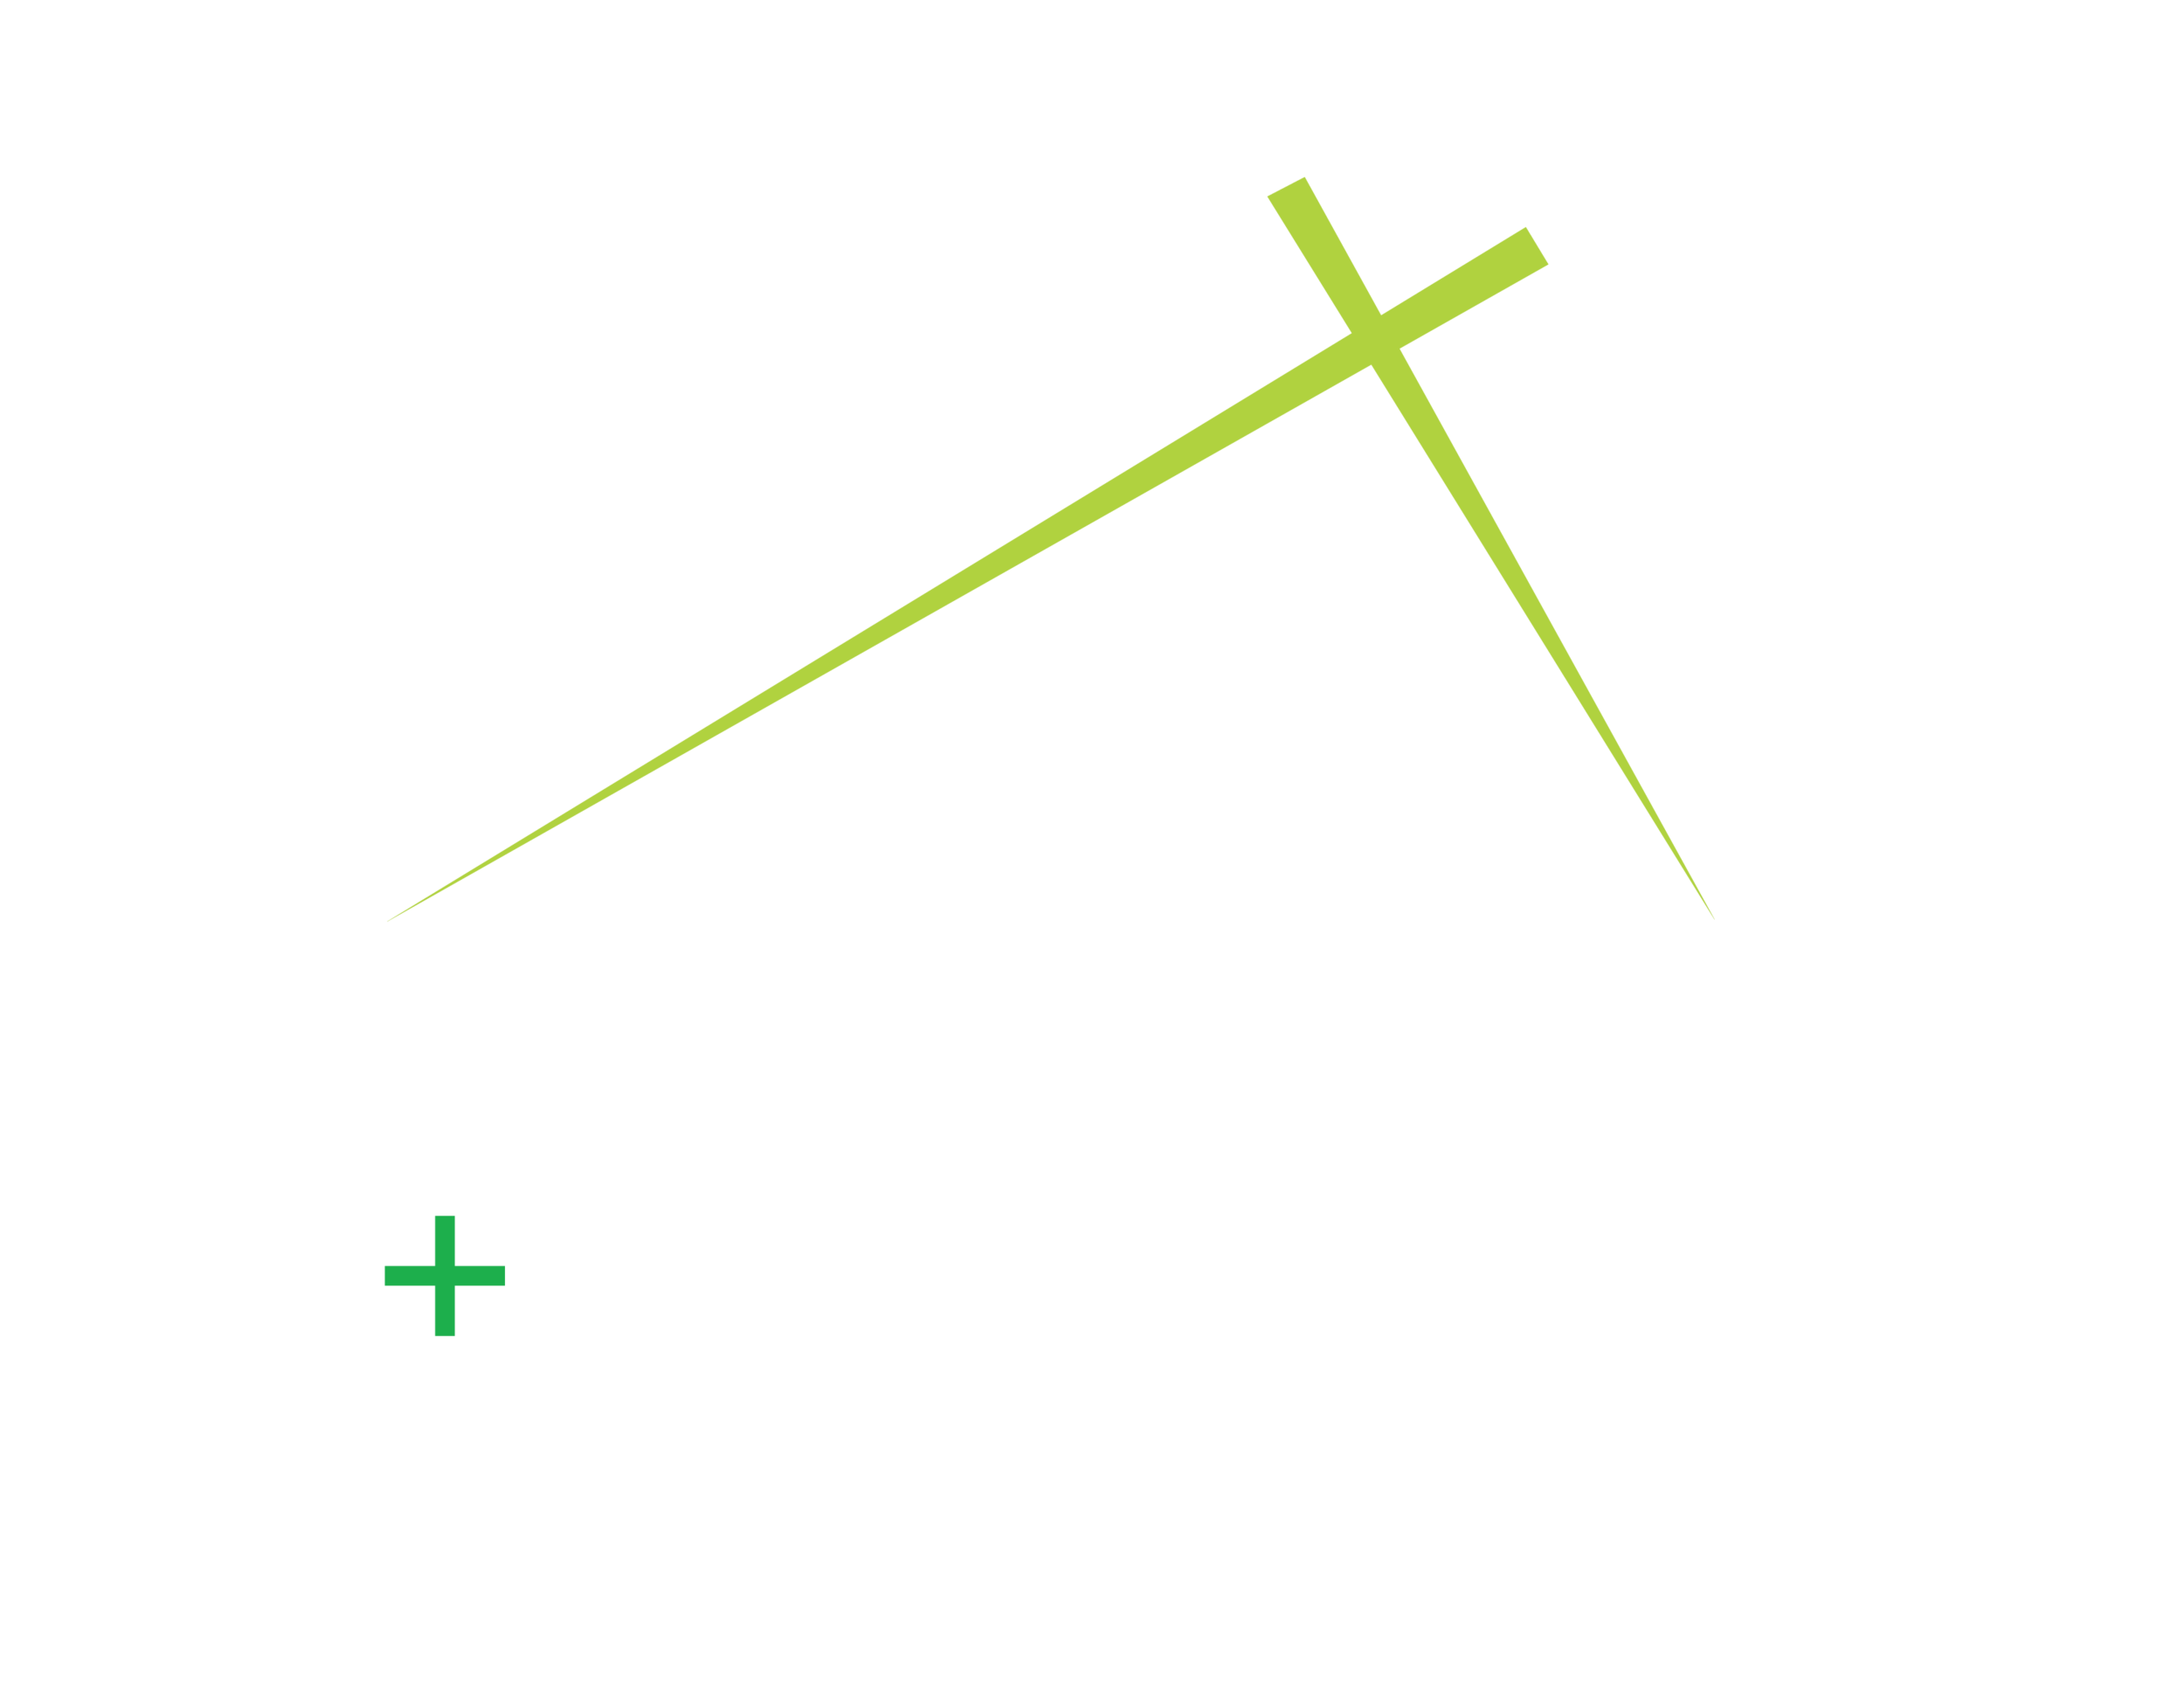 TSR-logo-0Greens-White-NoBG-01.png